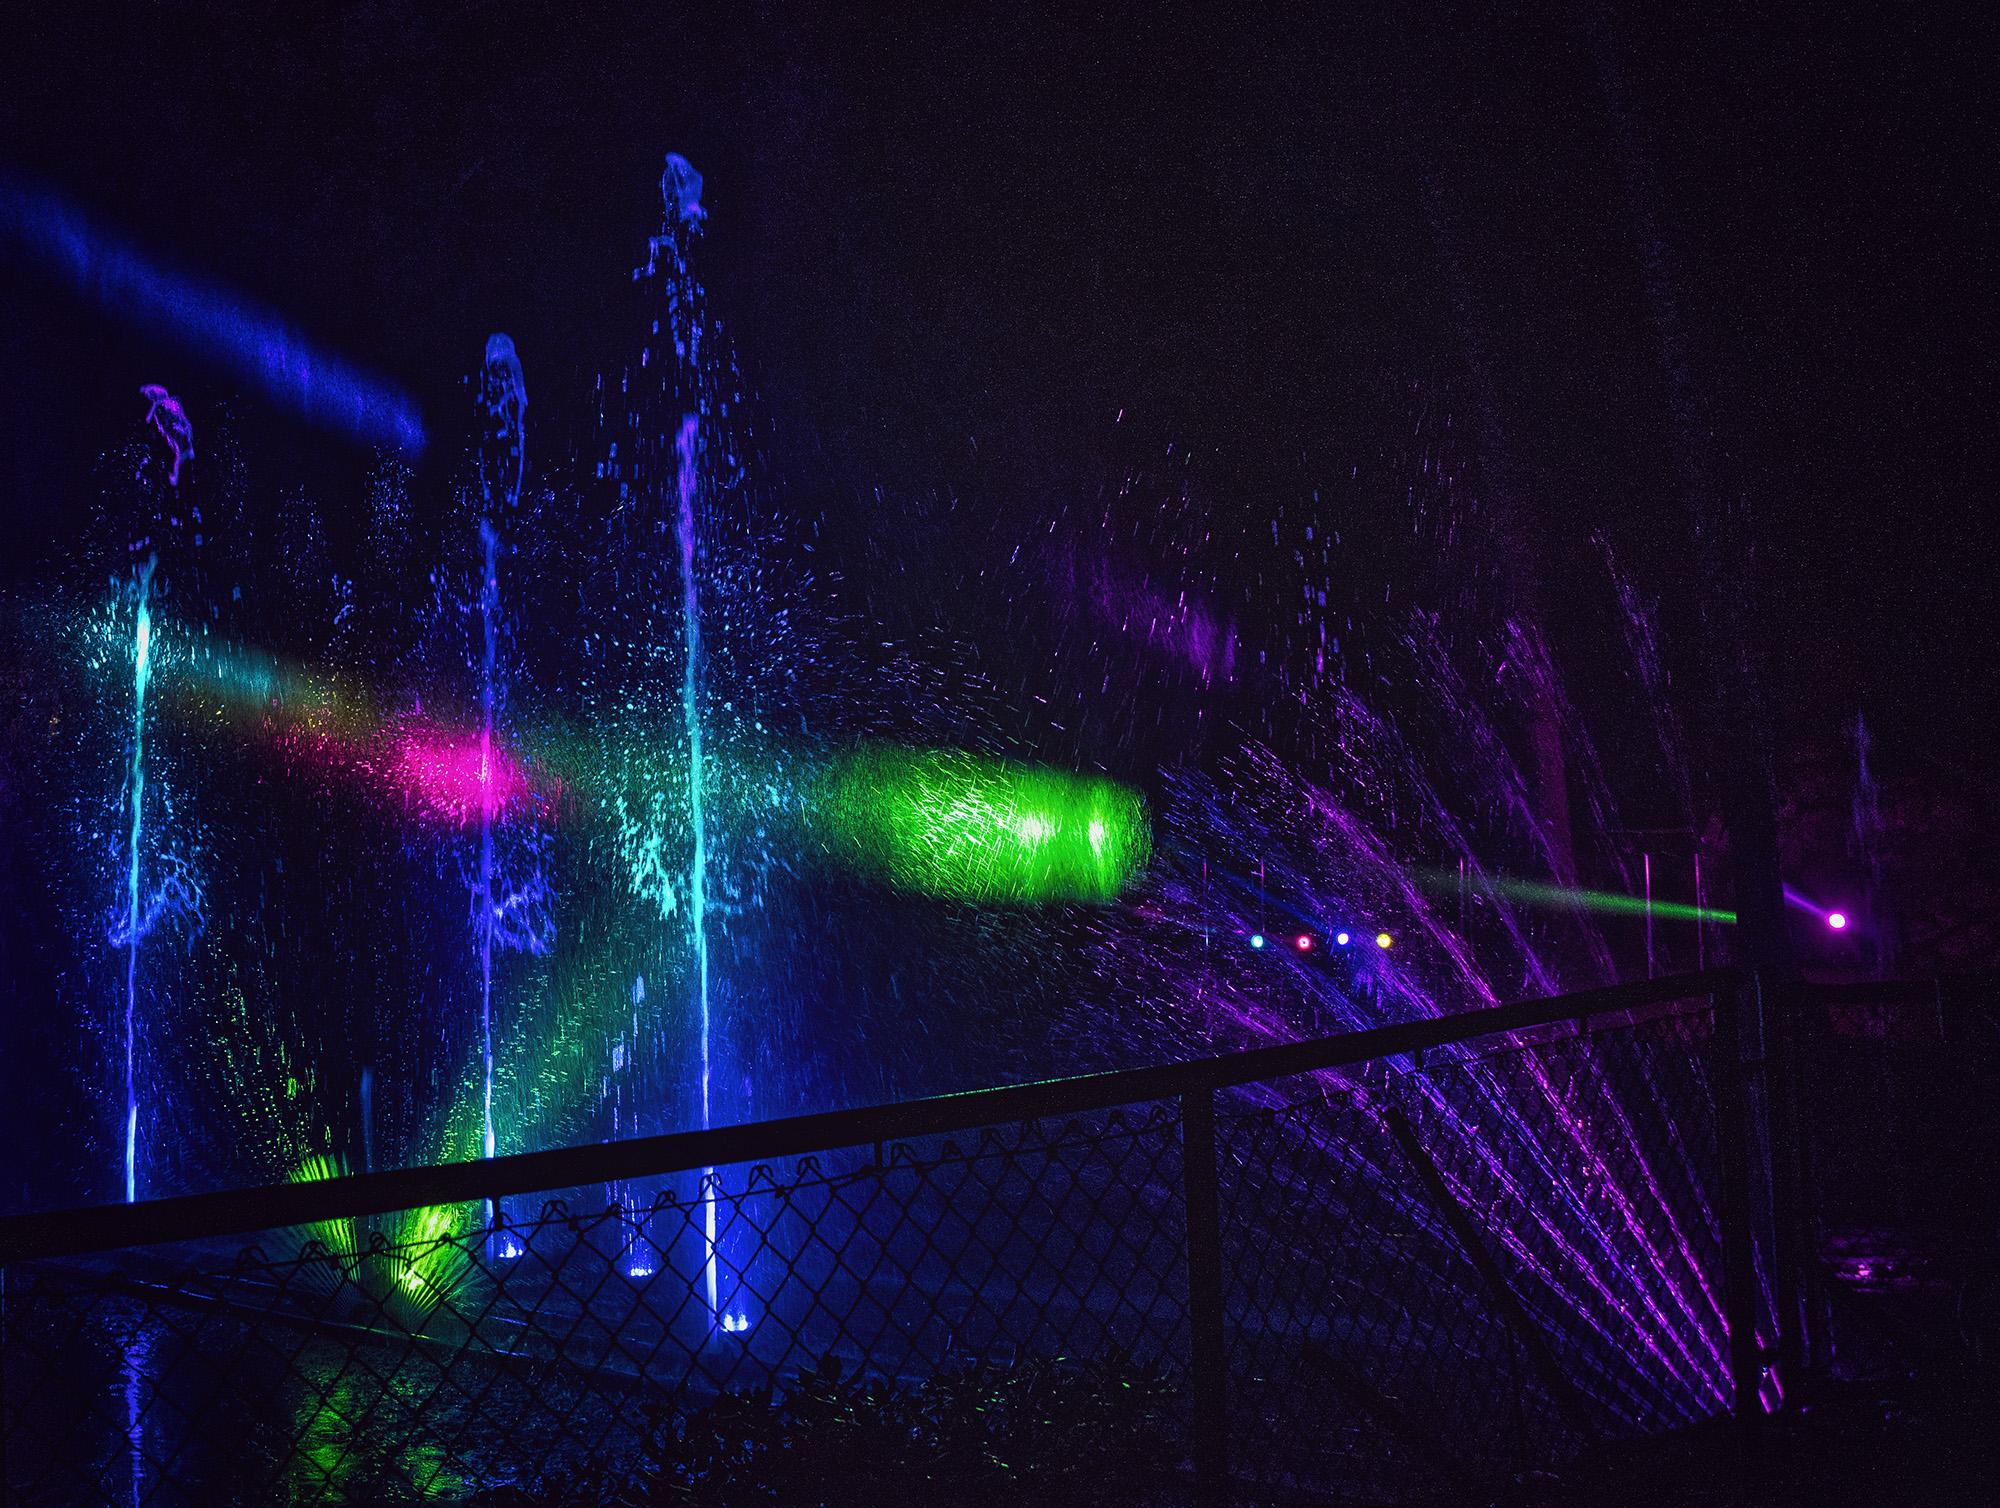 zoolights1_9low.jpg